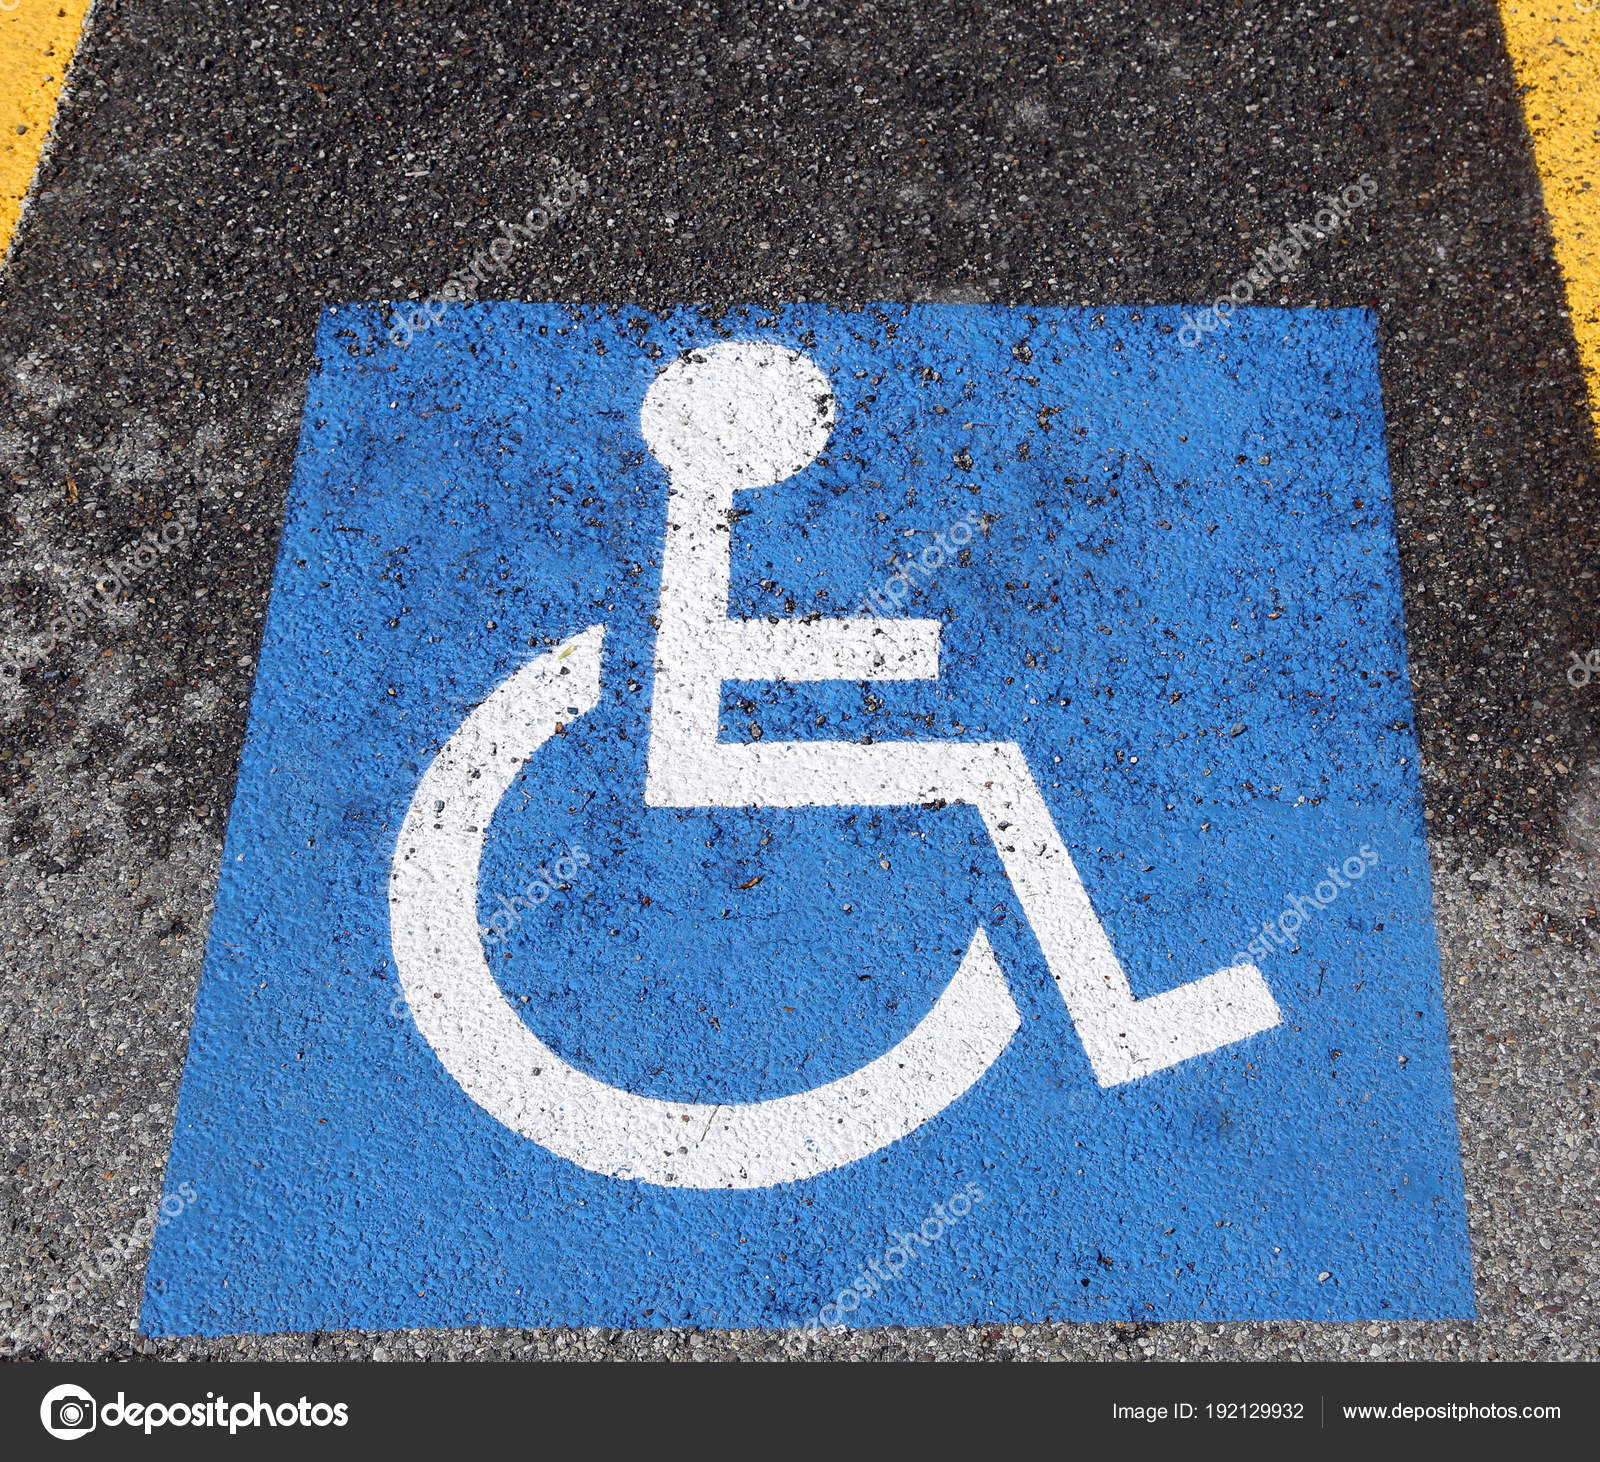 Wheelchair Symbol In The Car Parkingle Stock Photo Chiccododifc